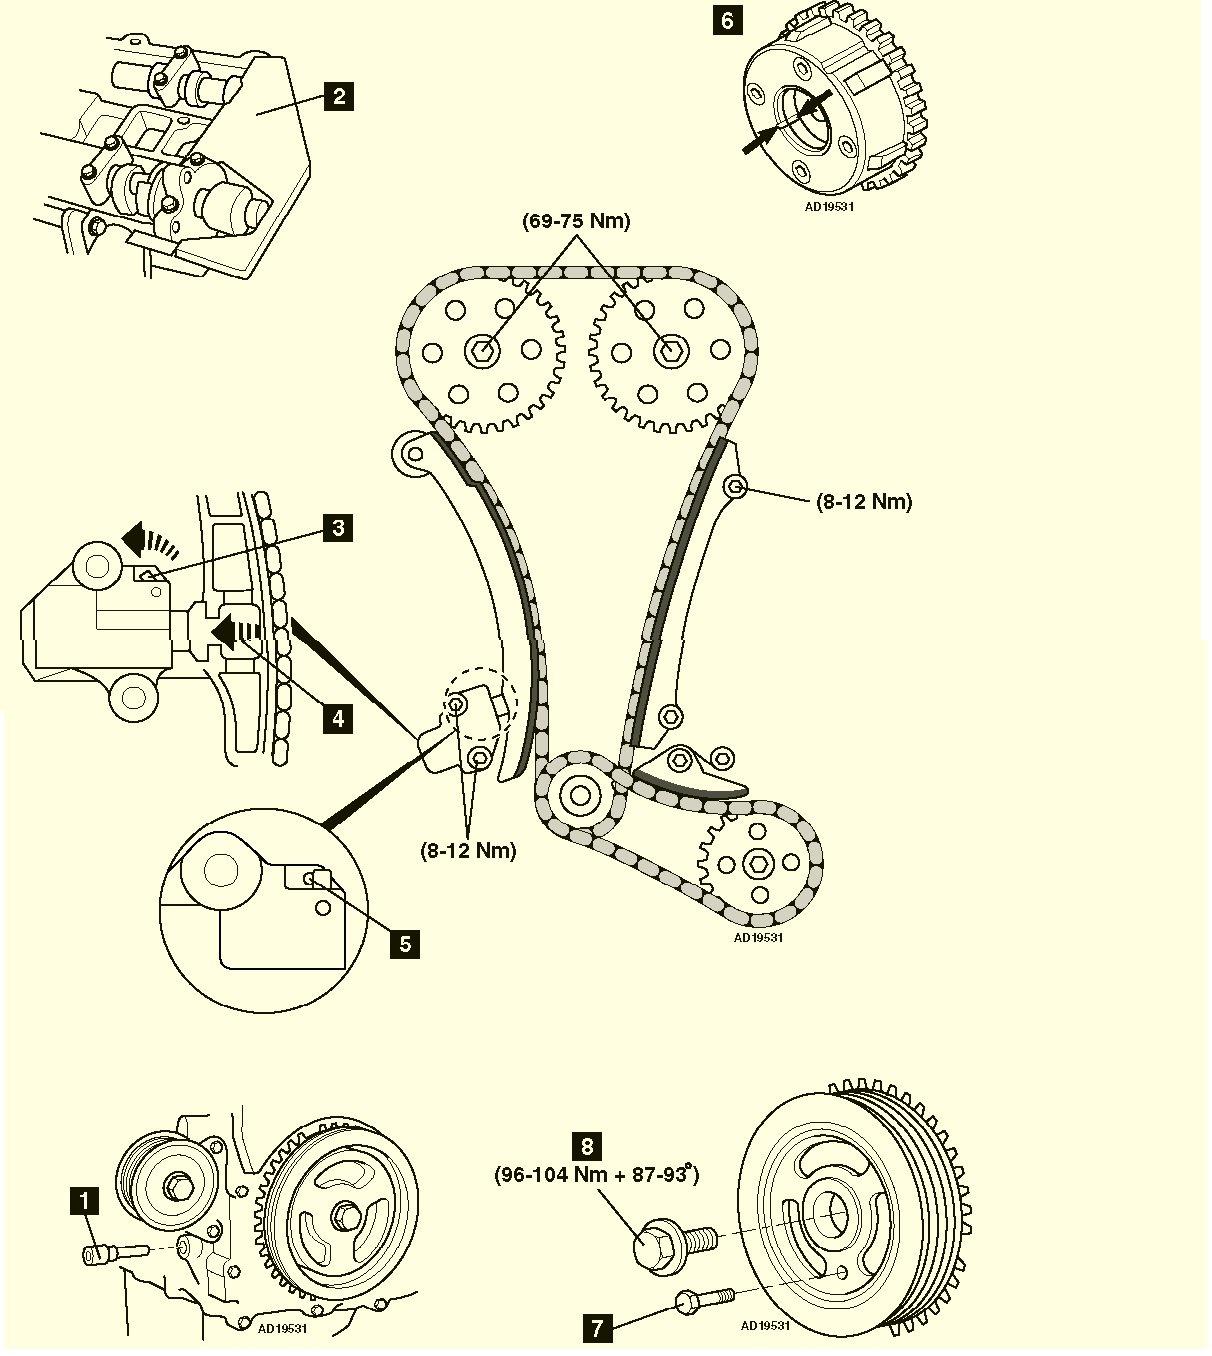 1988 Vw Cabriolet Wiring Diagram As Well 2006 Jetta 2007 Volkswagen Rabbit Parts Get Free Image